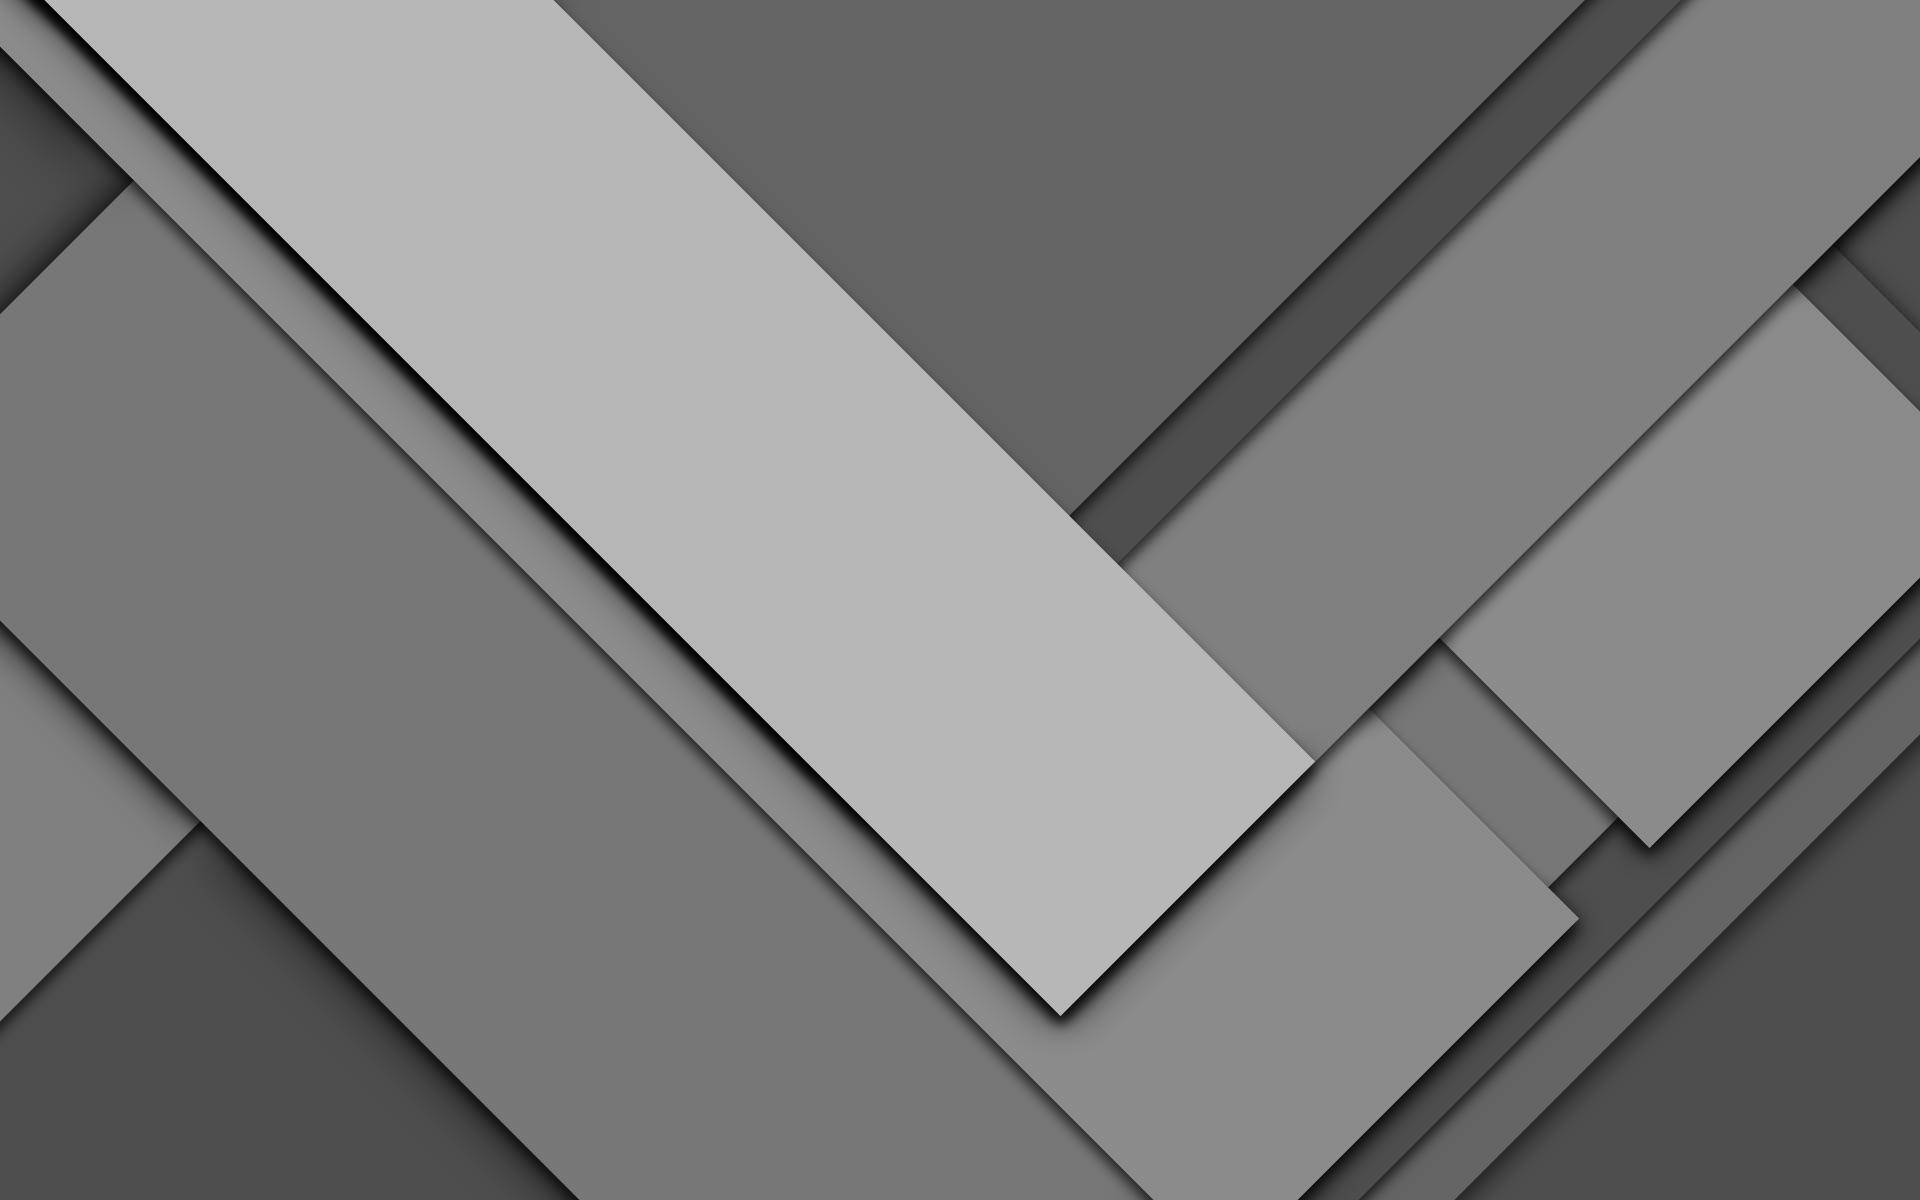 480x800 material design grey galaxy note htc desire nokia for Material design wallpaper 4k